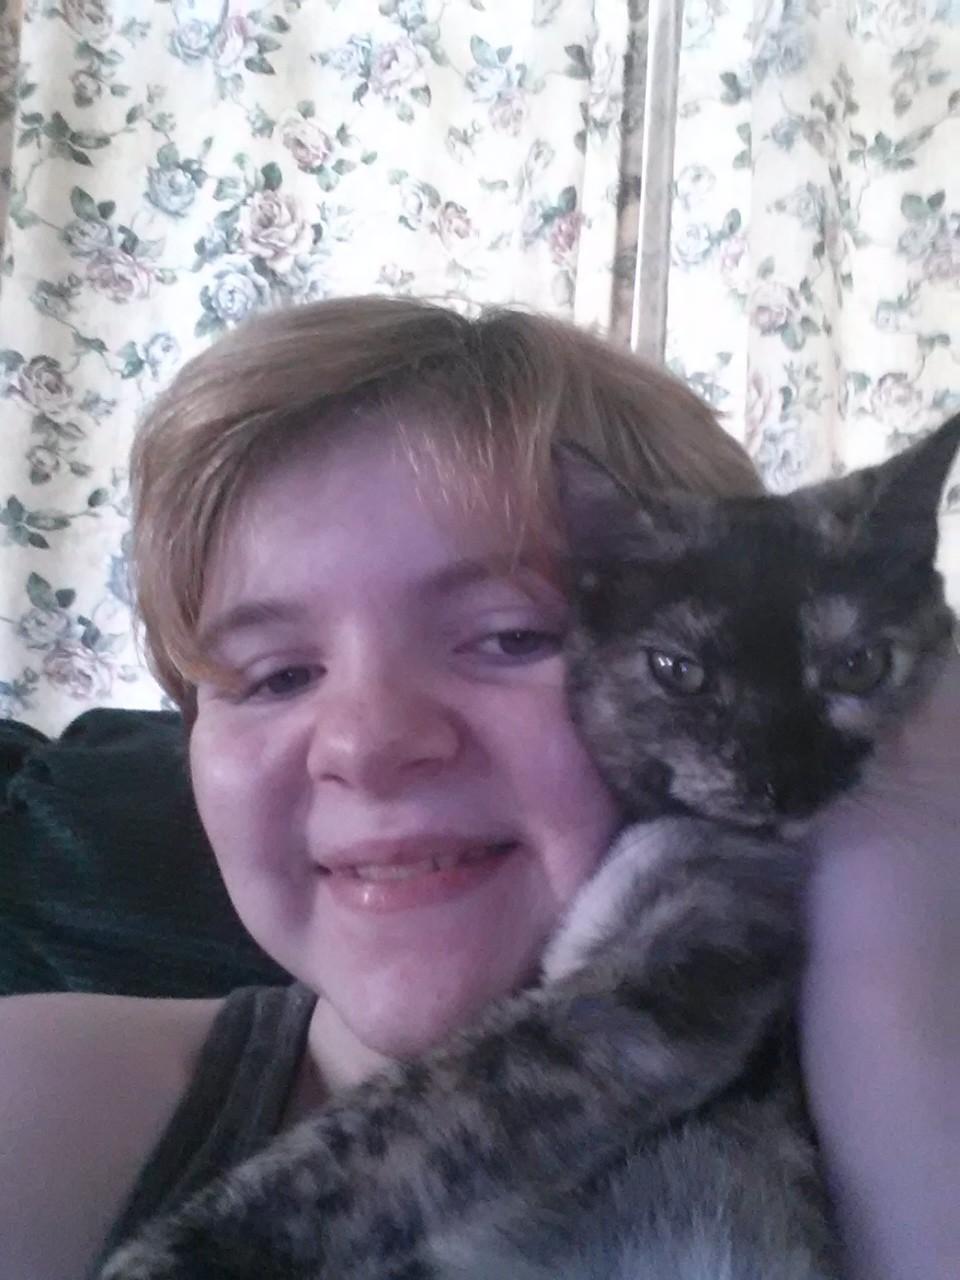 Selfie with my cat.